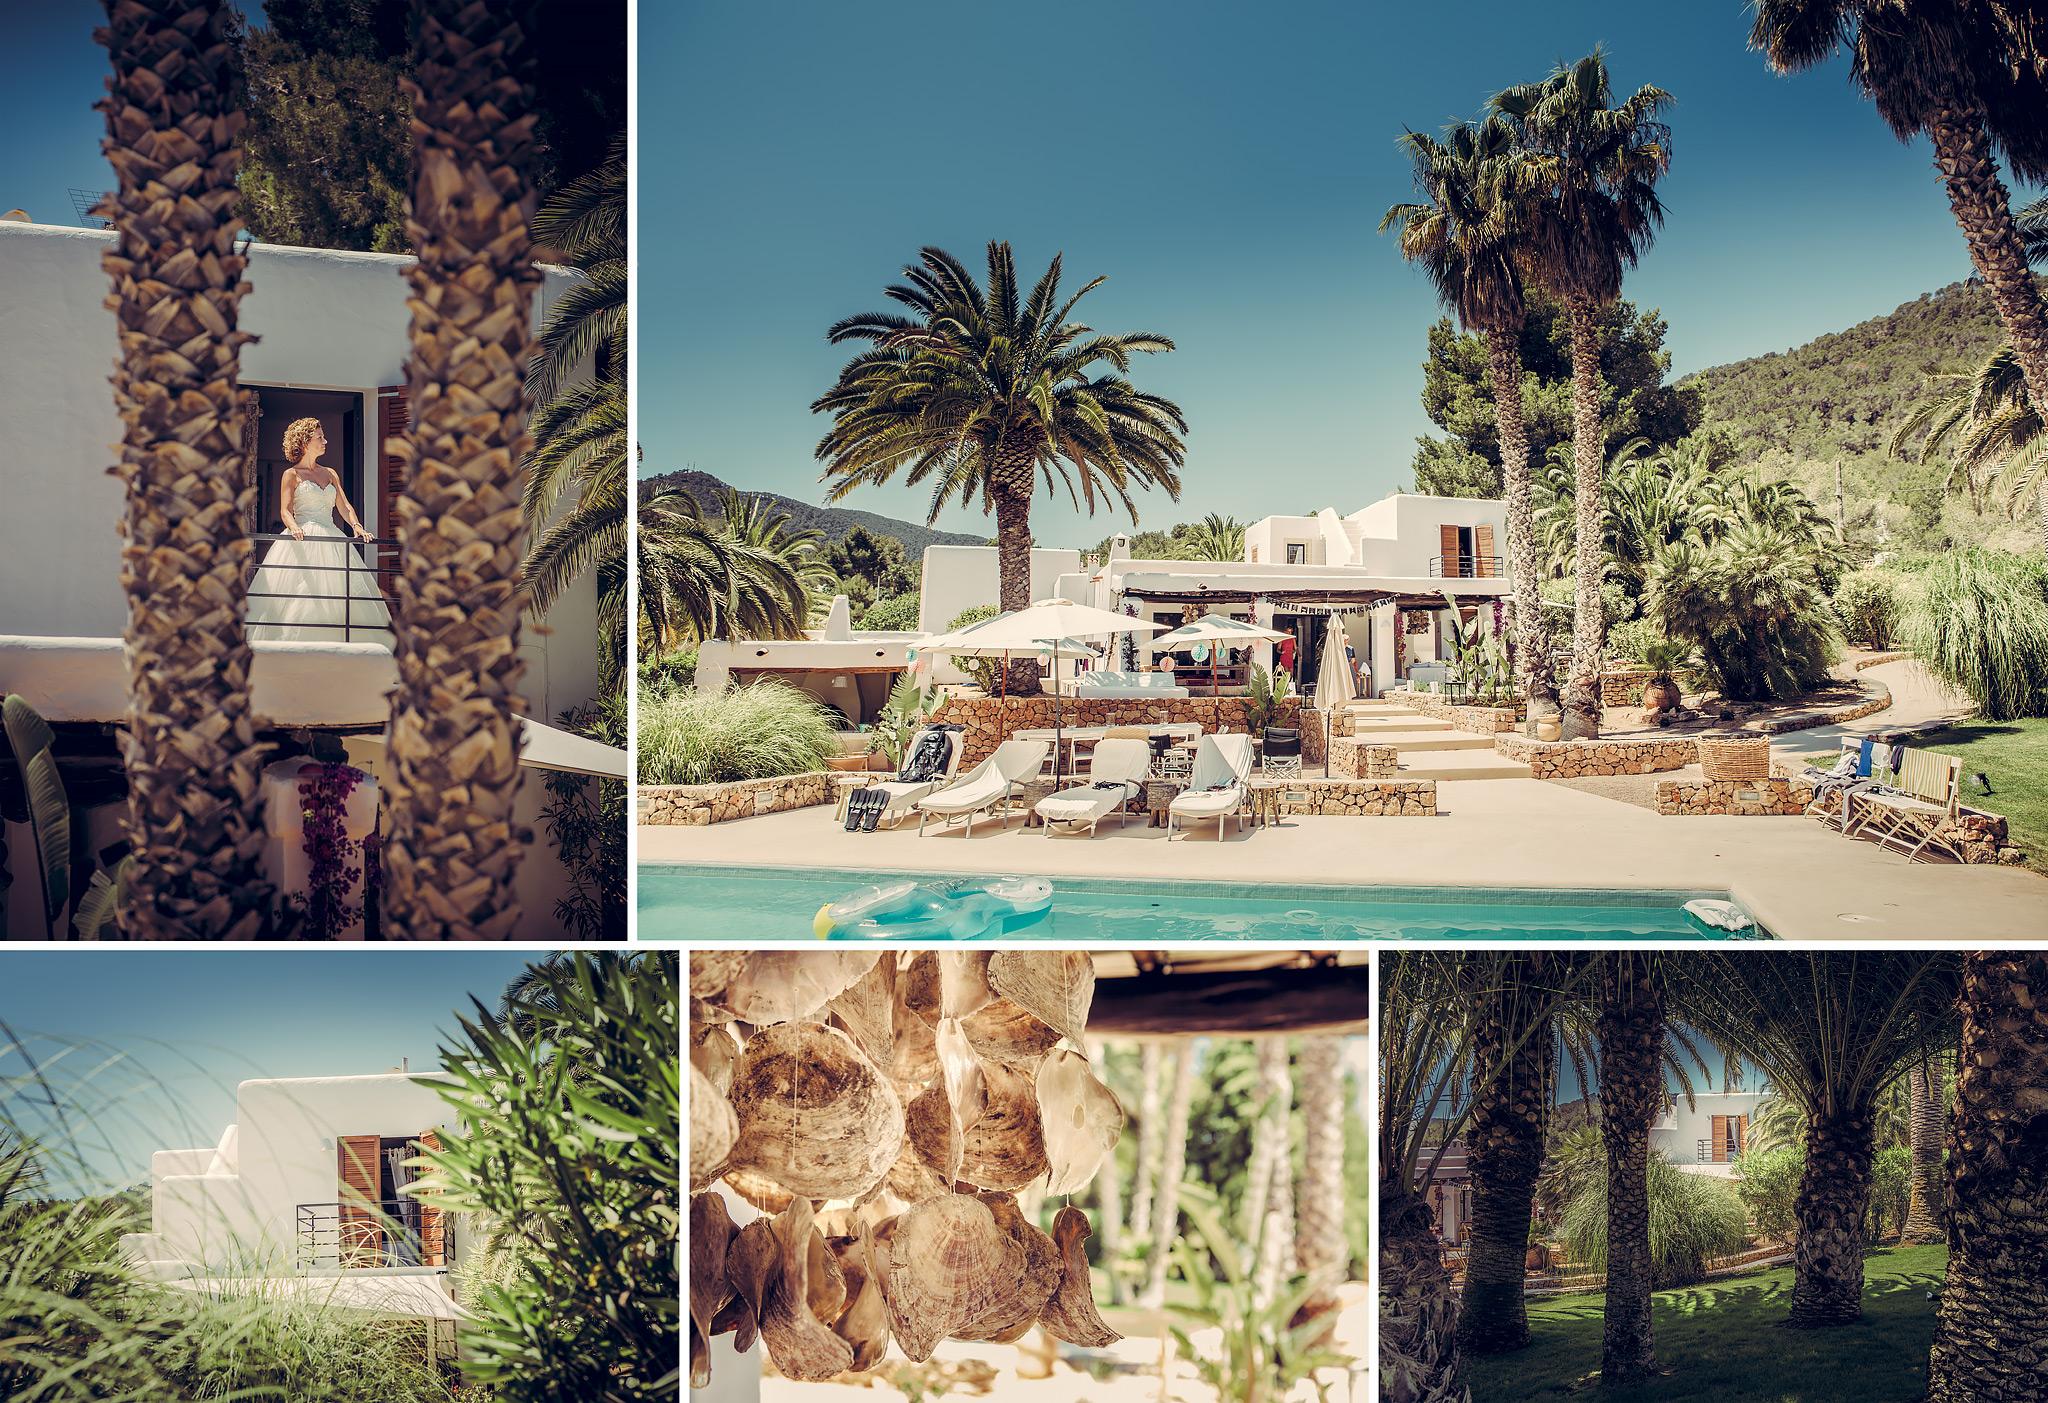 Bruidsreportage Destination Wedding Ibiza Mandy en Joost 008 - Bas Driessen Fotografie